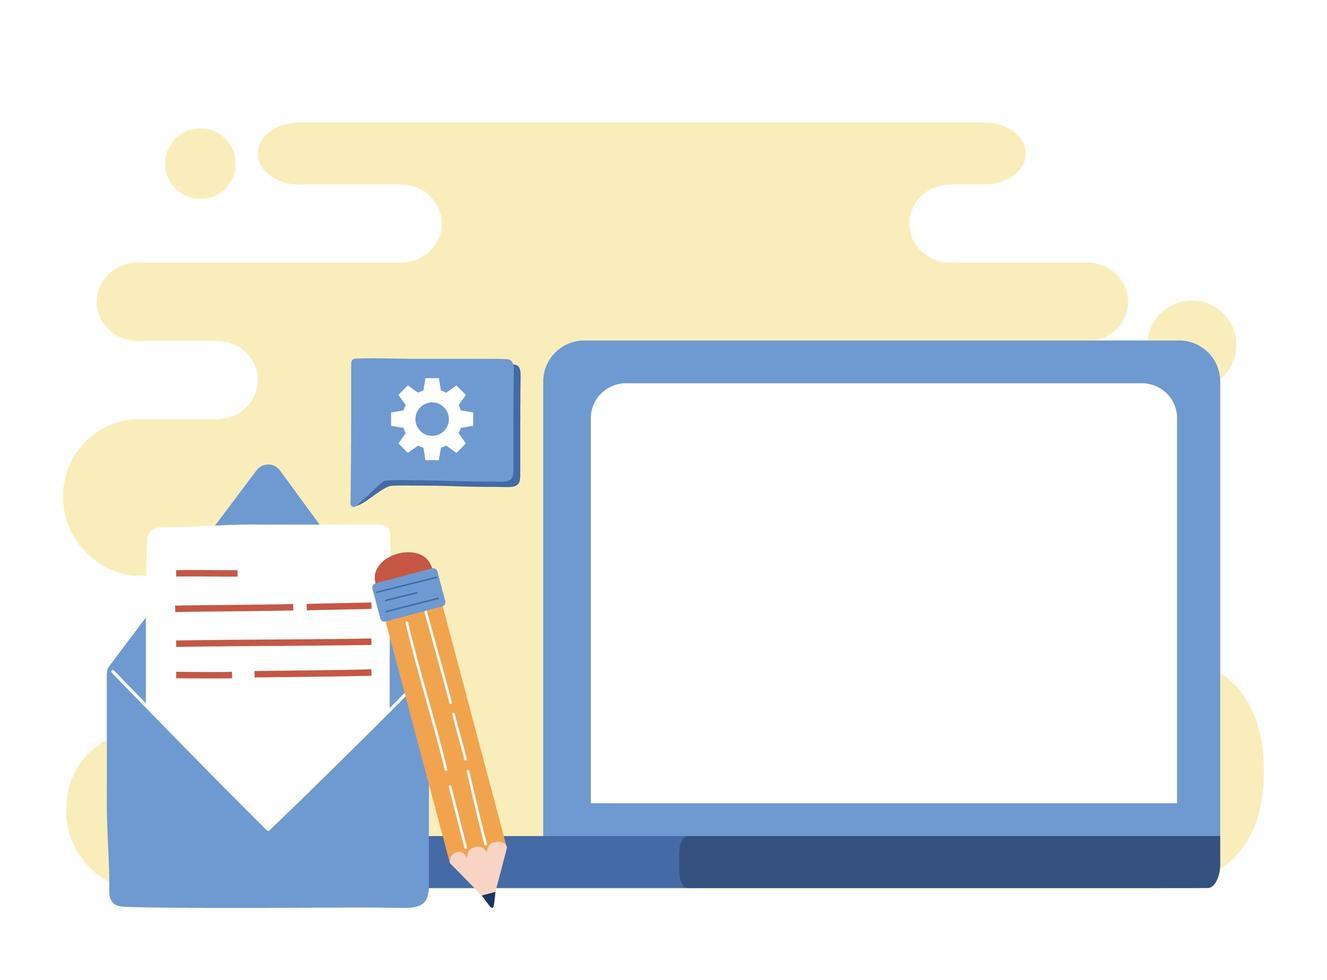 digitalt kommunikationskoncept via e-post vektor